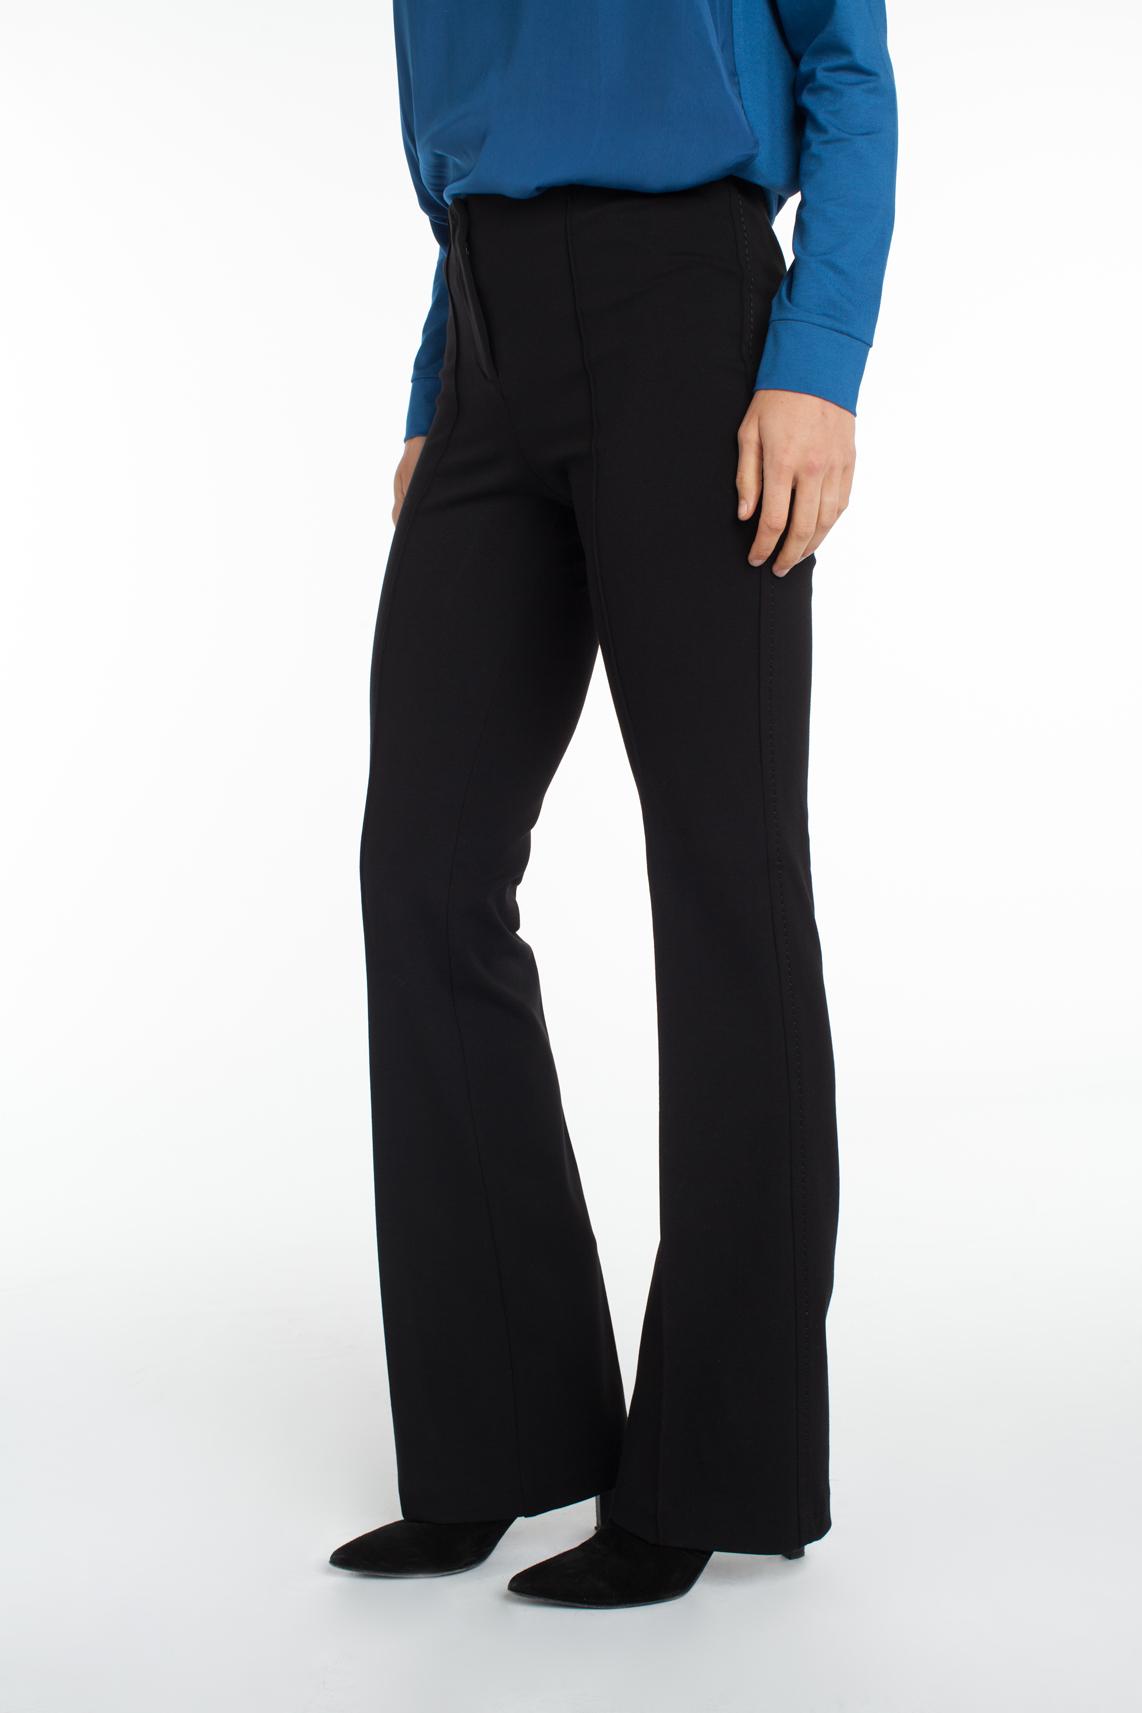 Cambio Dames Ros flared pantalon zwart